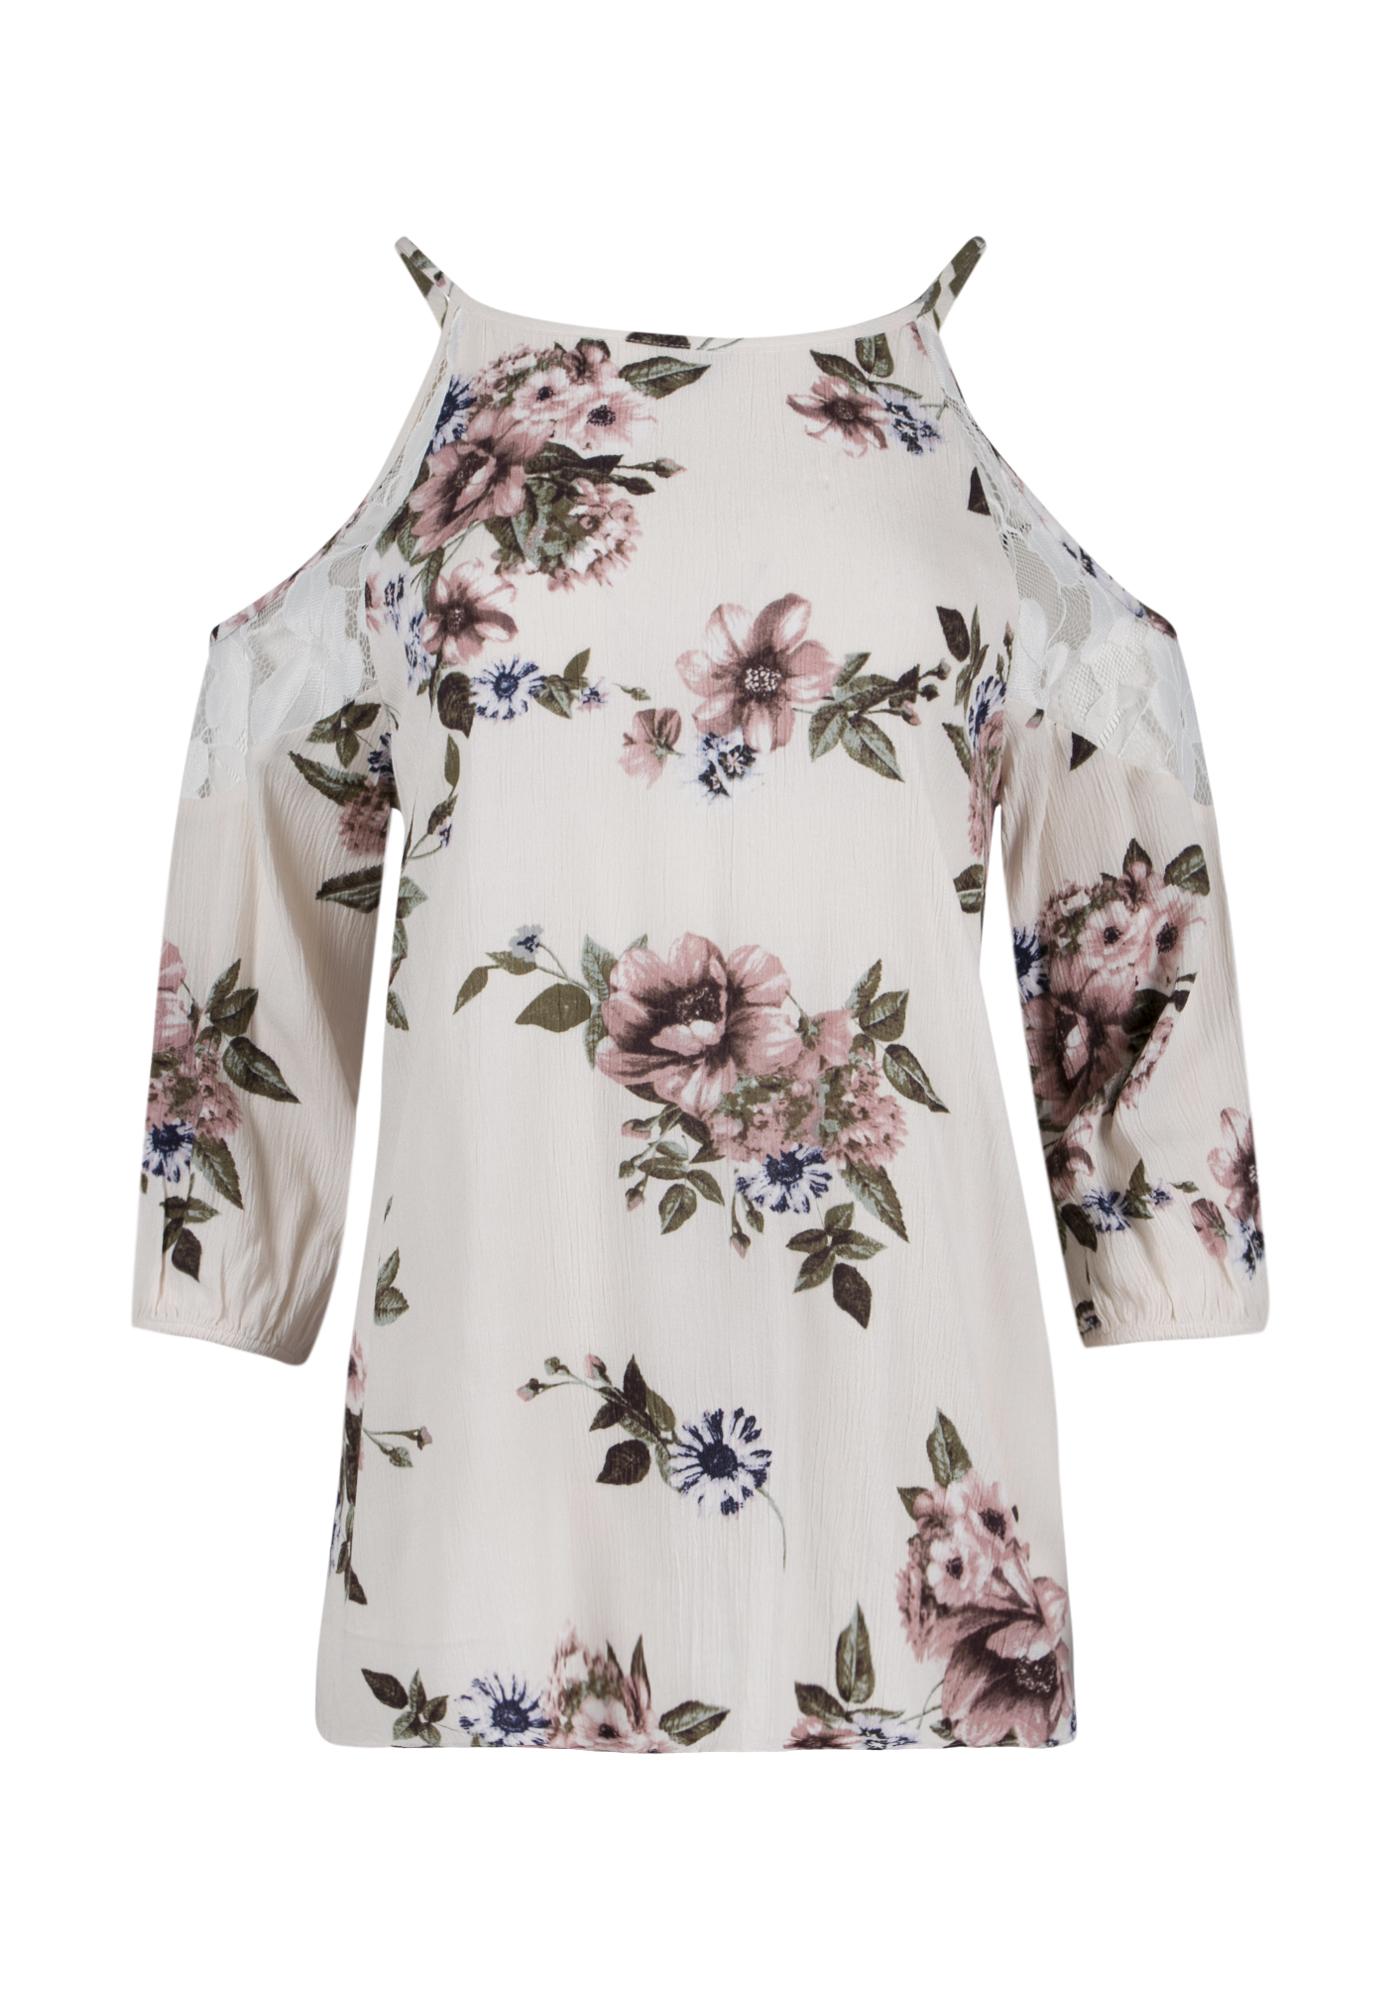 ccdacc5abee8f Ladies  Floral Cold Shoulder Top